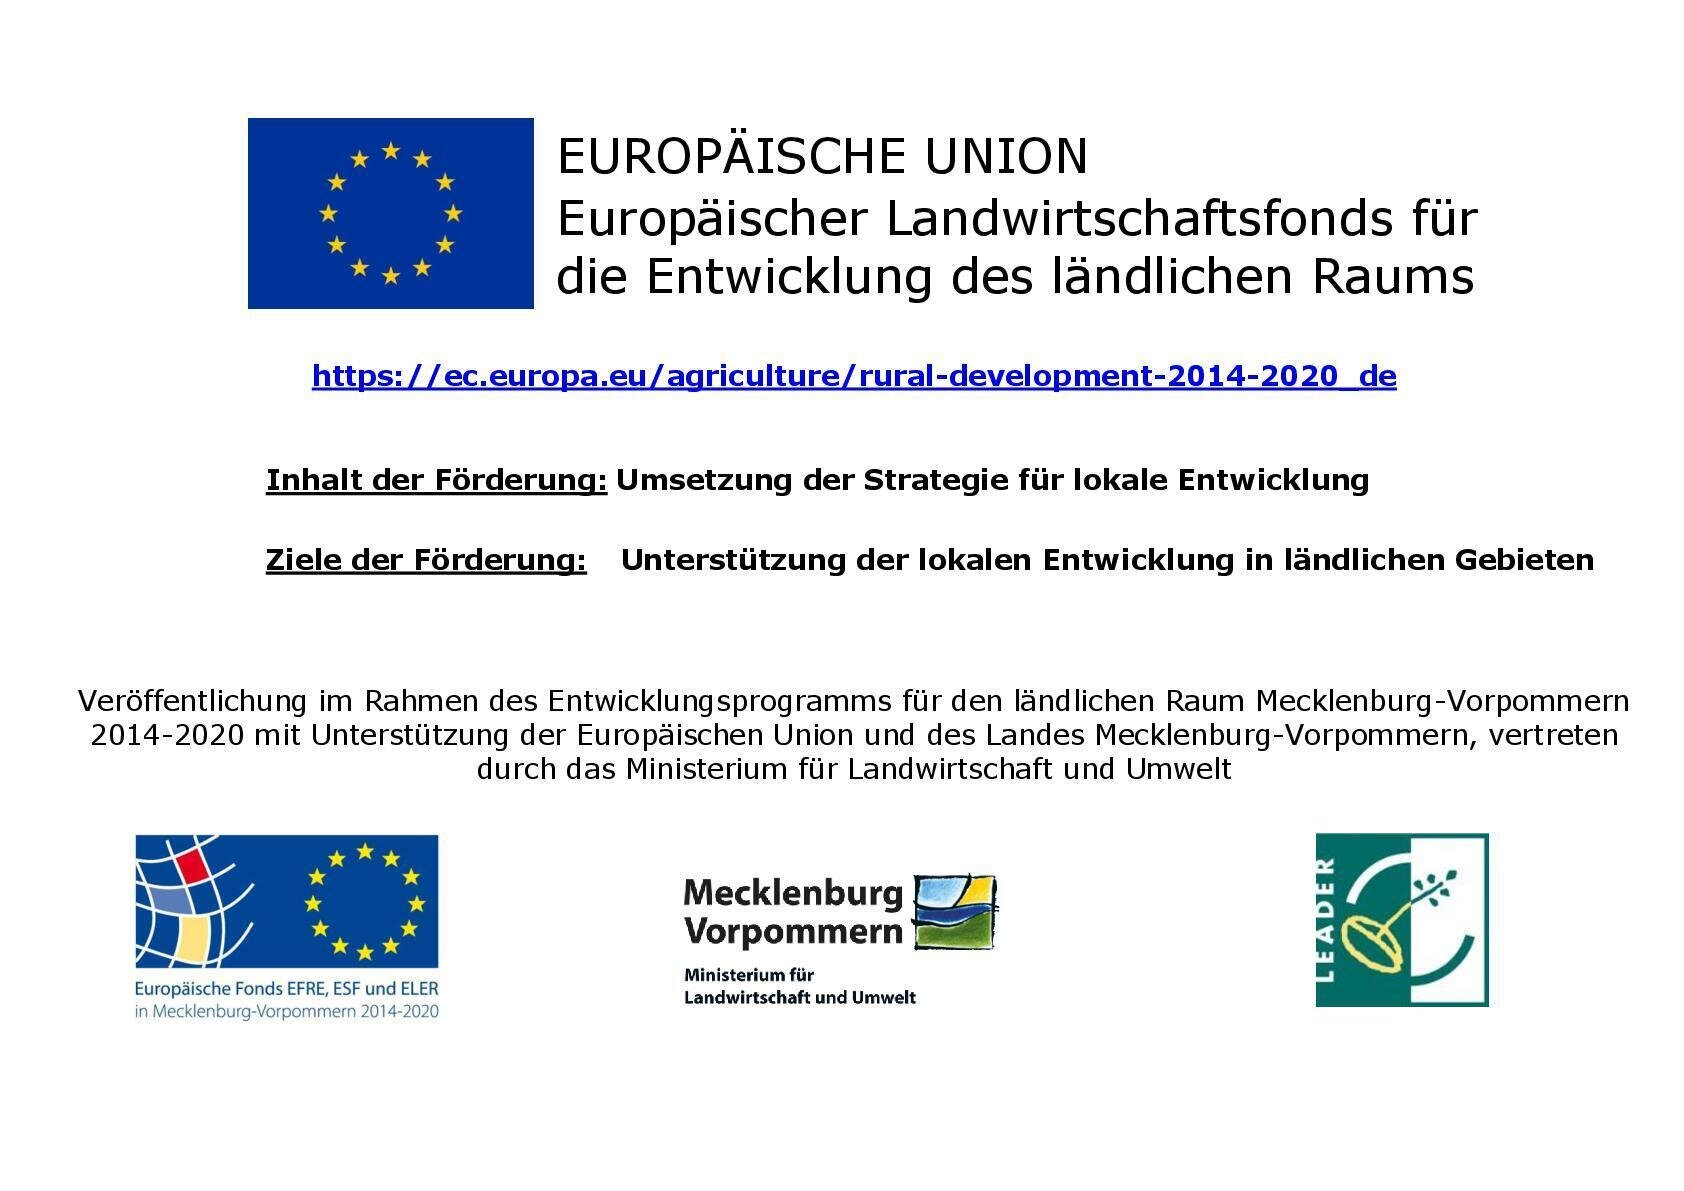 https://ec.europa.eu/agriculture/rural-development-2014-2020_de